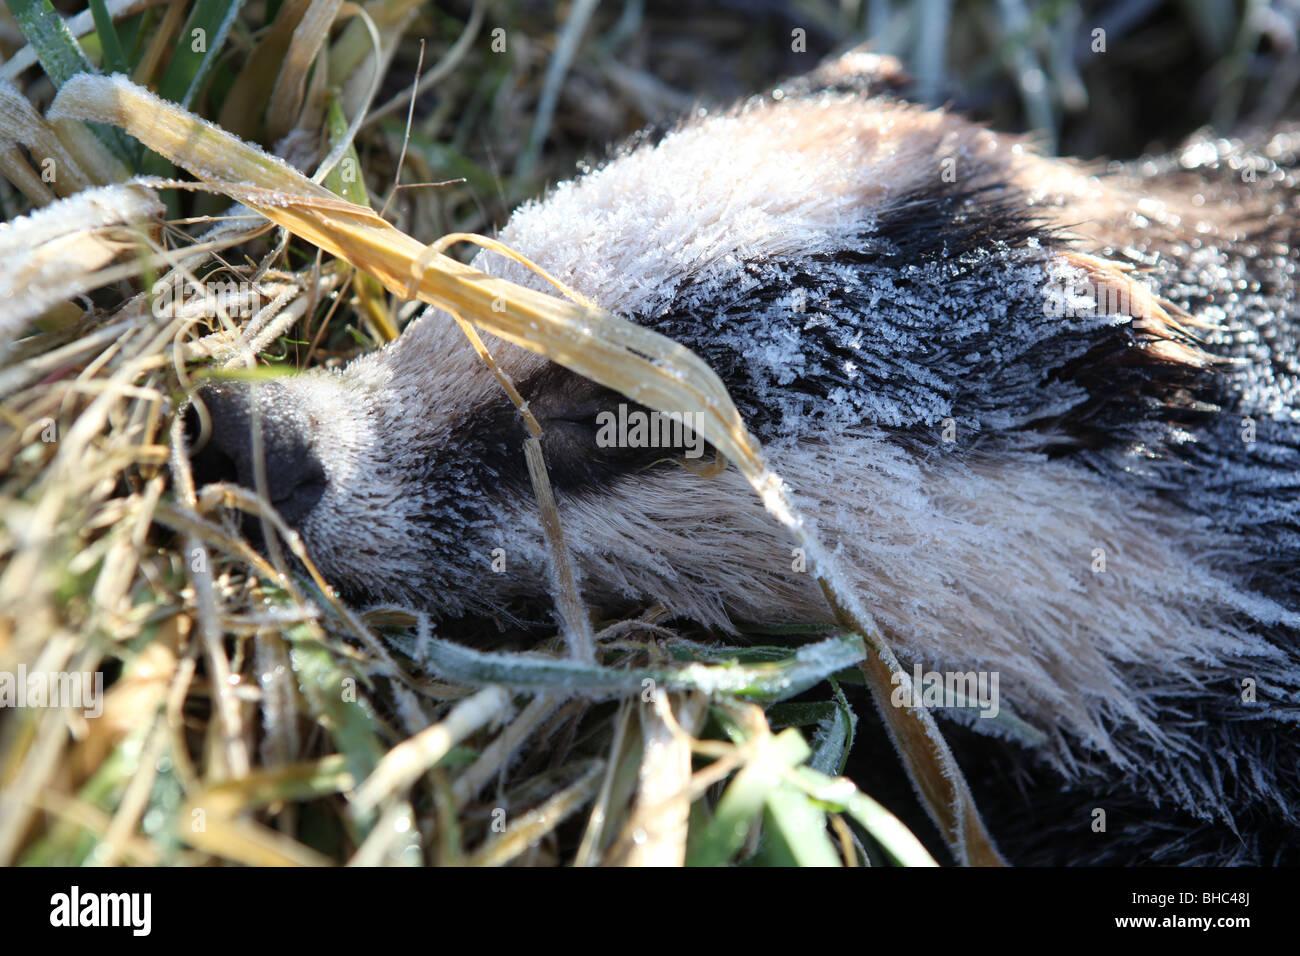 badger,cull,TB,freeze,bovine,DEFRA,tuberculosis, - Stock Image